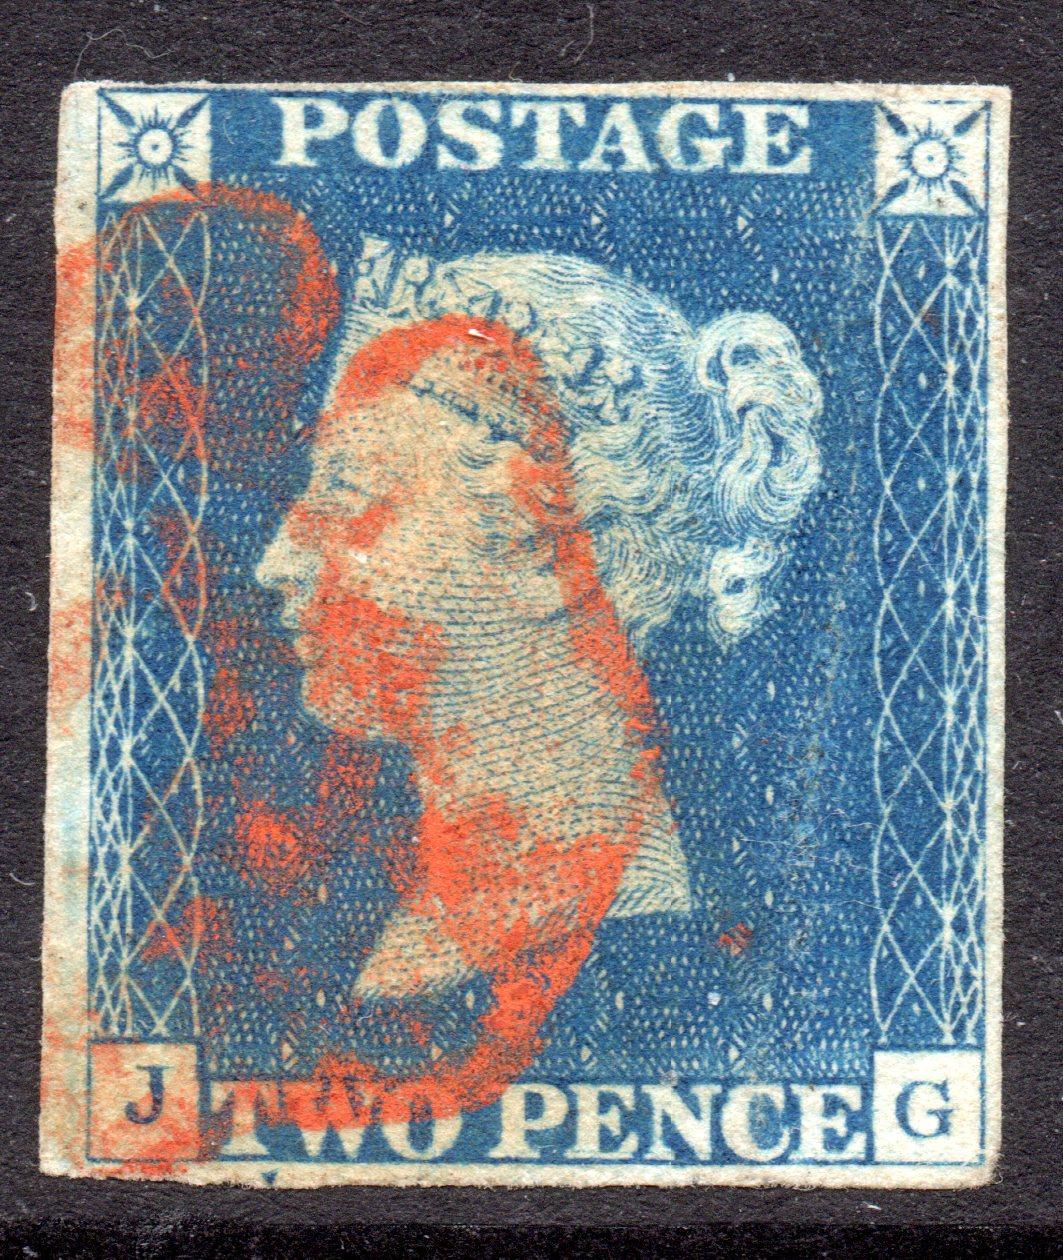 1840 2d Bright Blue Plate 1 BRIGHT ORANGE-RED MX - SOLD